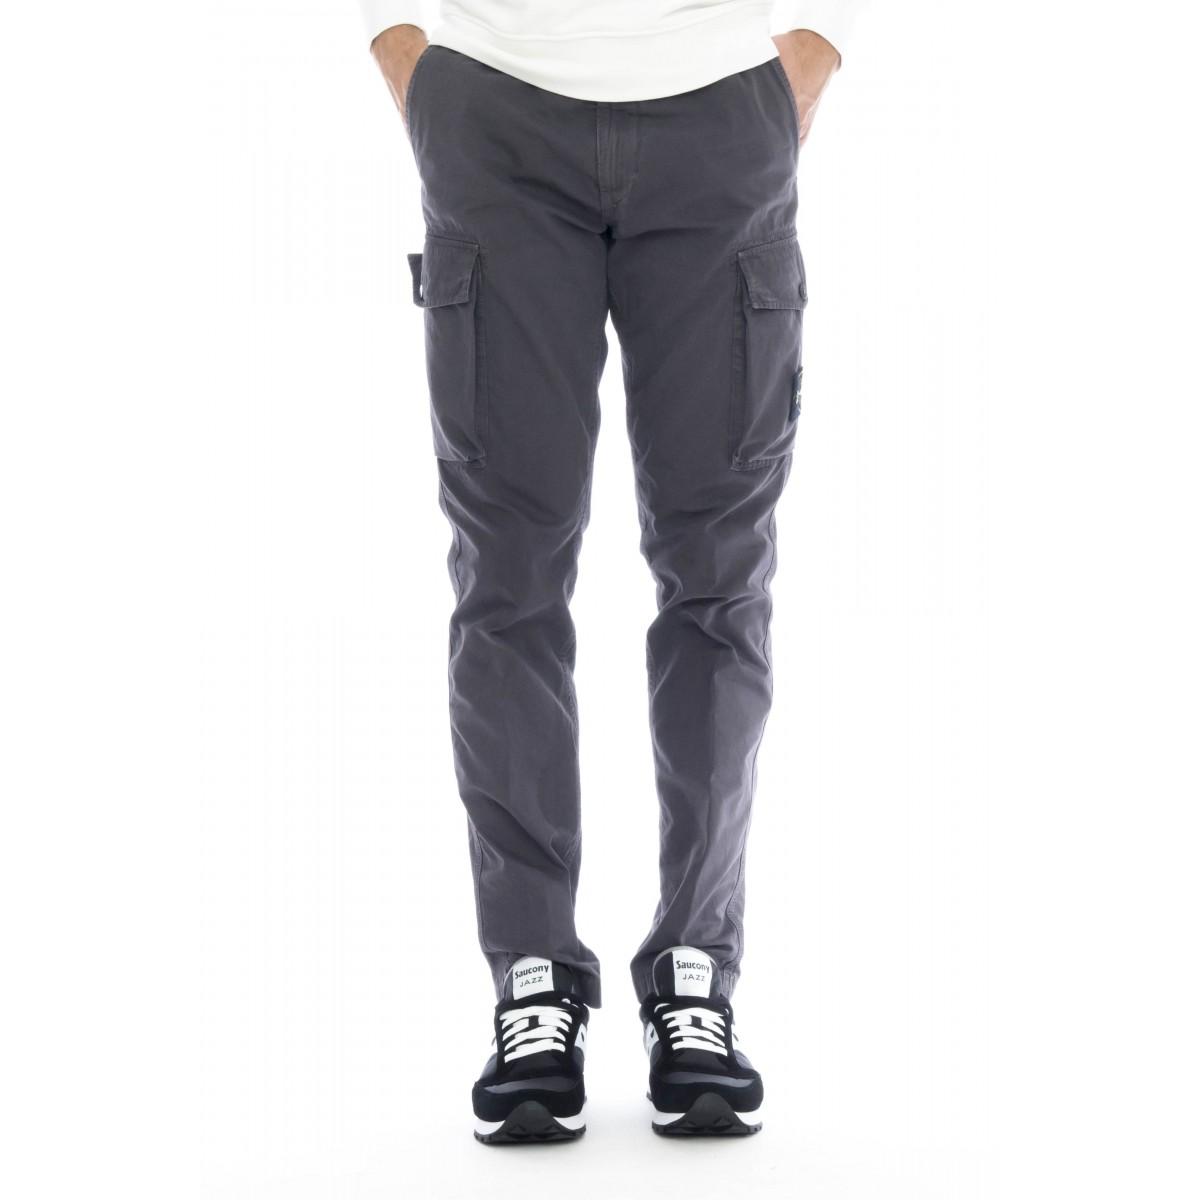 Pantalone uomo - 318wa pantalone tasche slim tela smerigliata